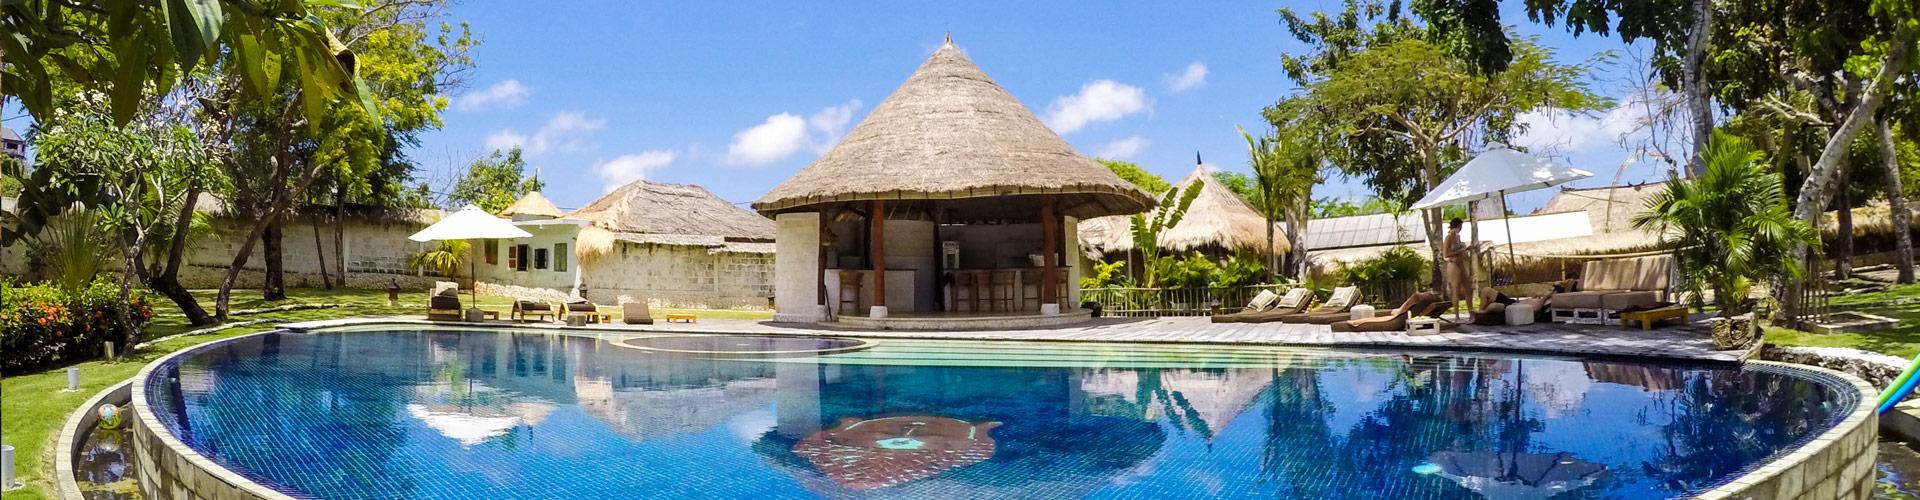 Surf Resort Maldives & Indonesia